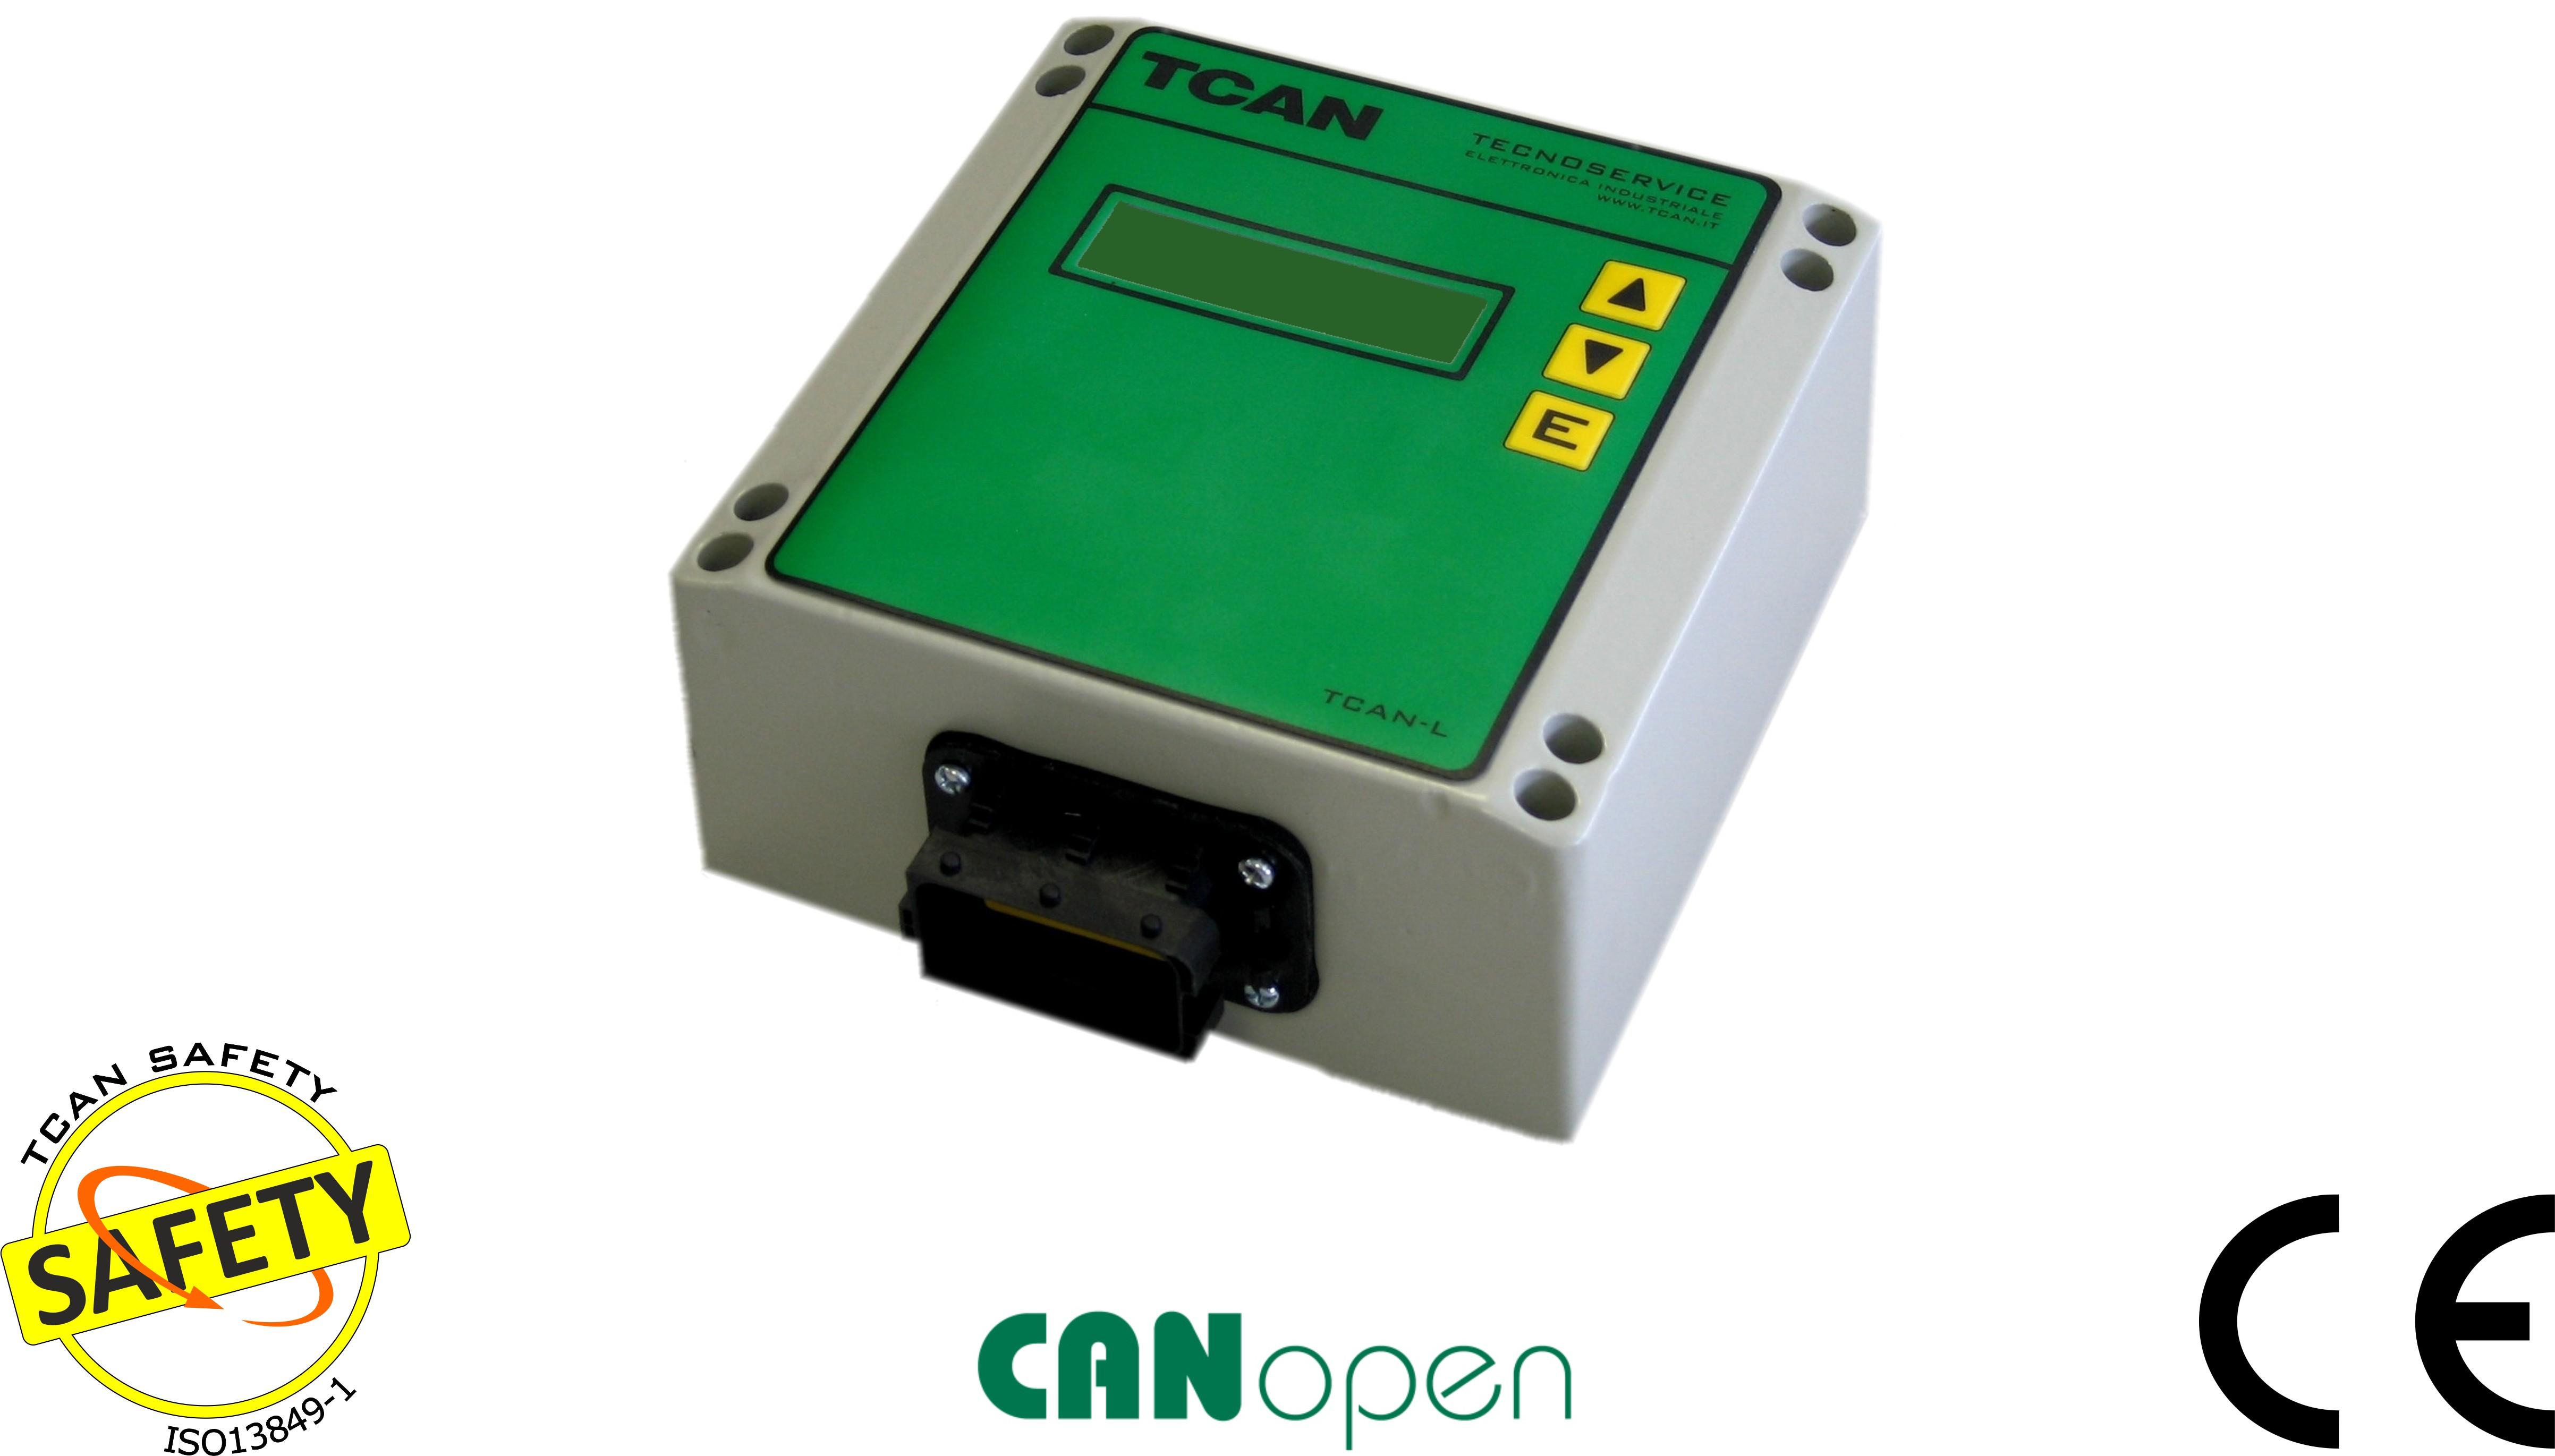 TCAN-LIVP Image